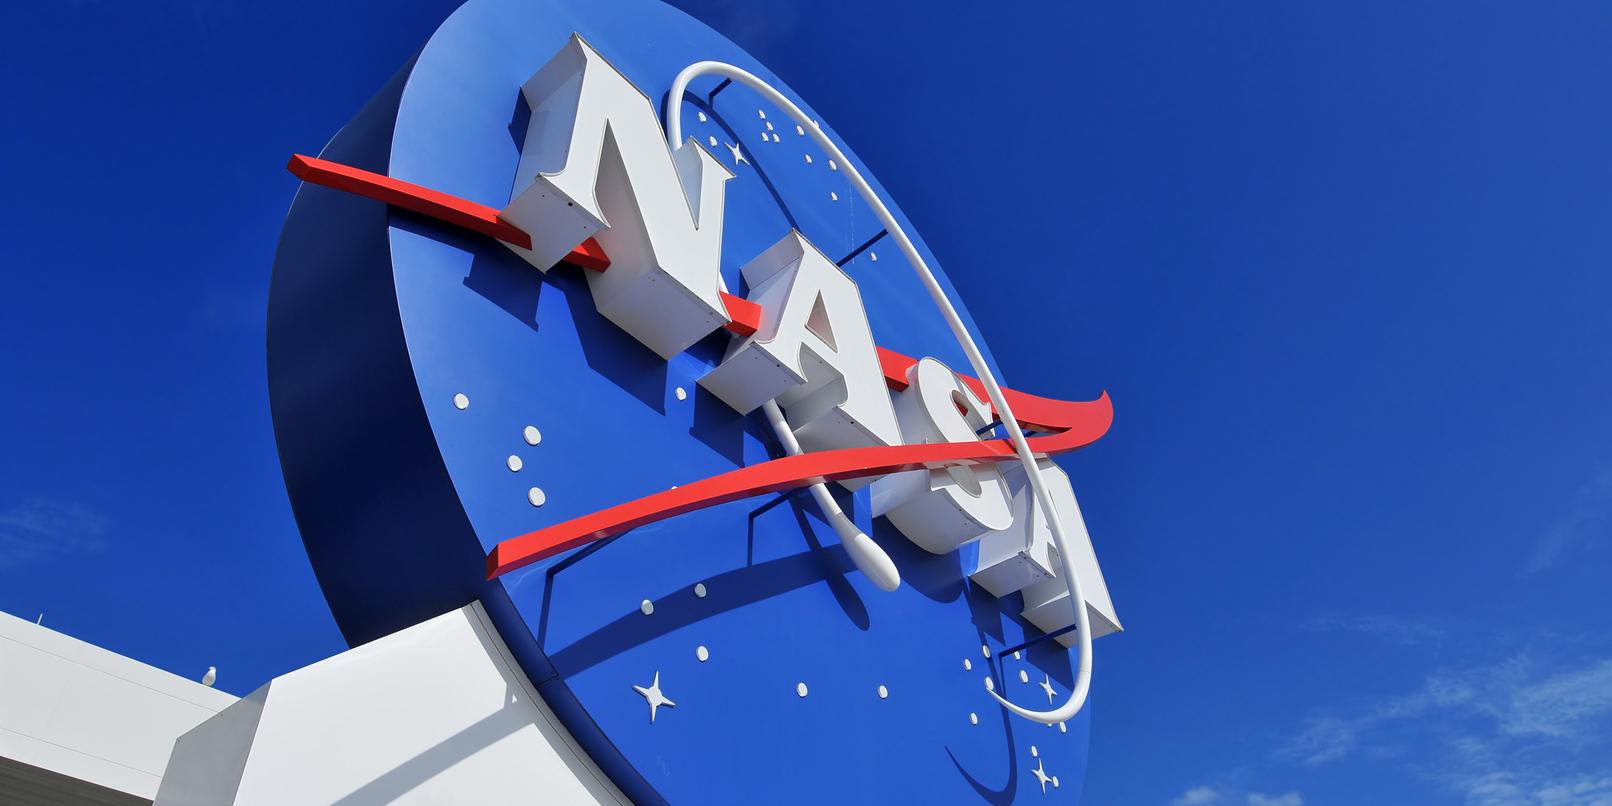 shutterstock_70213219 NASA